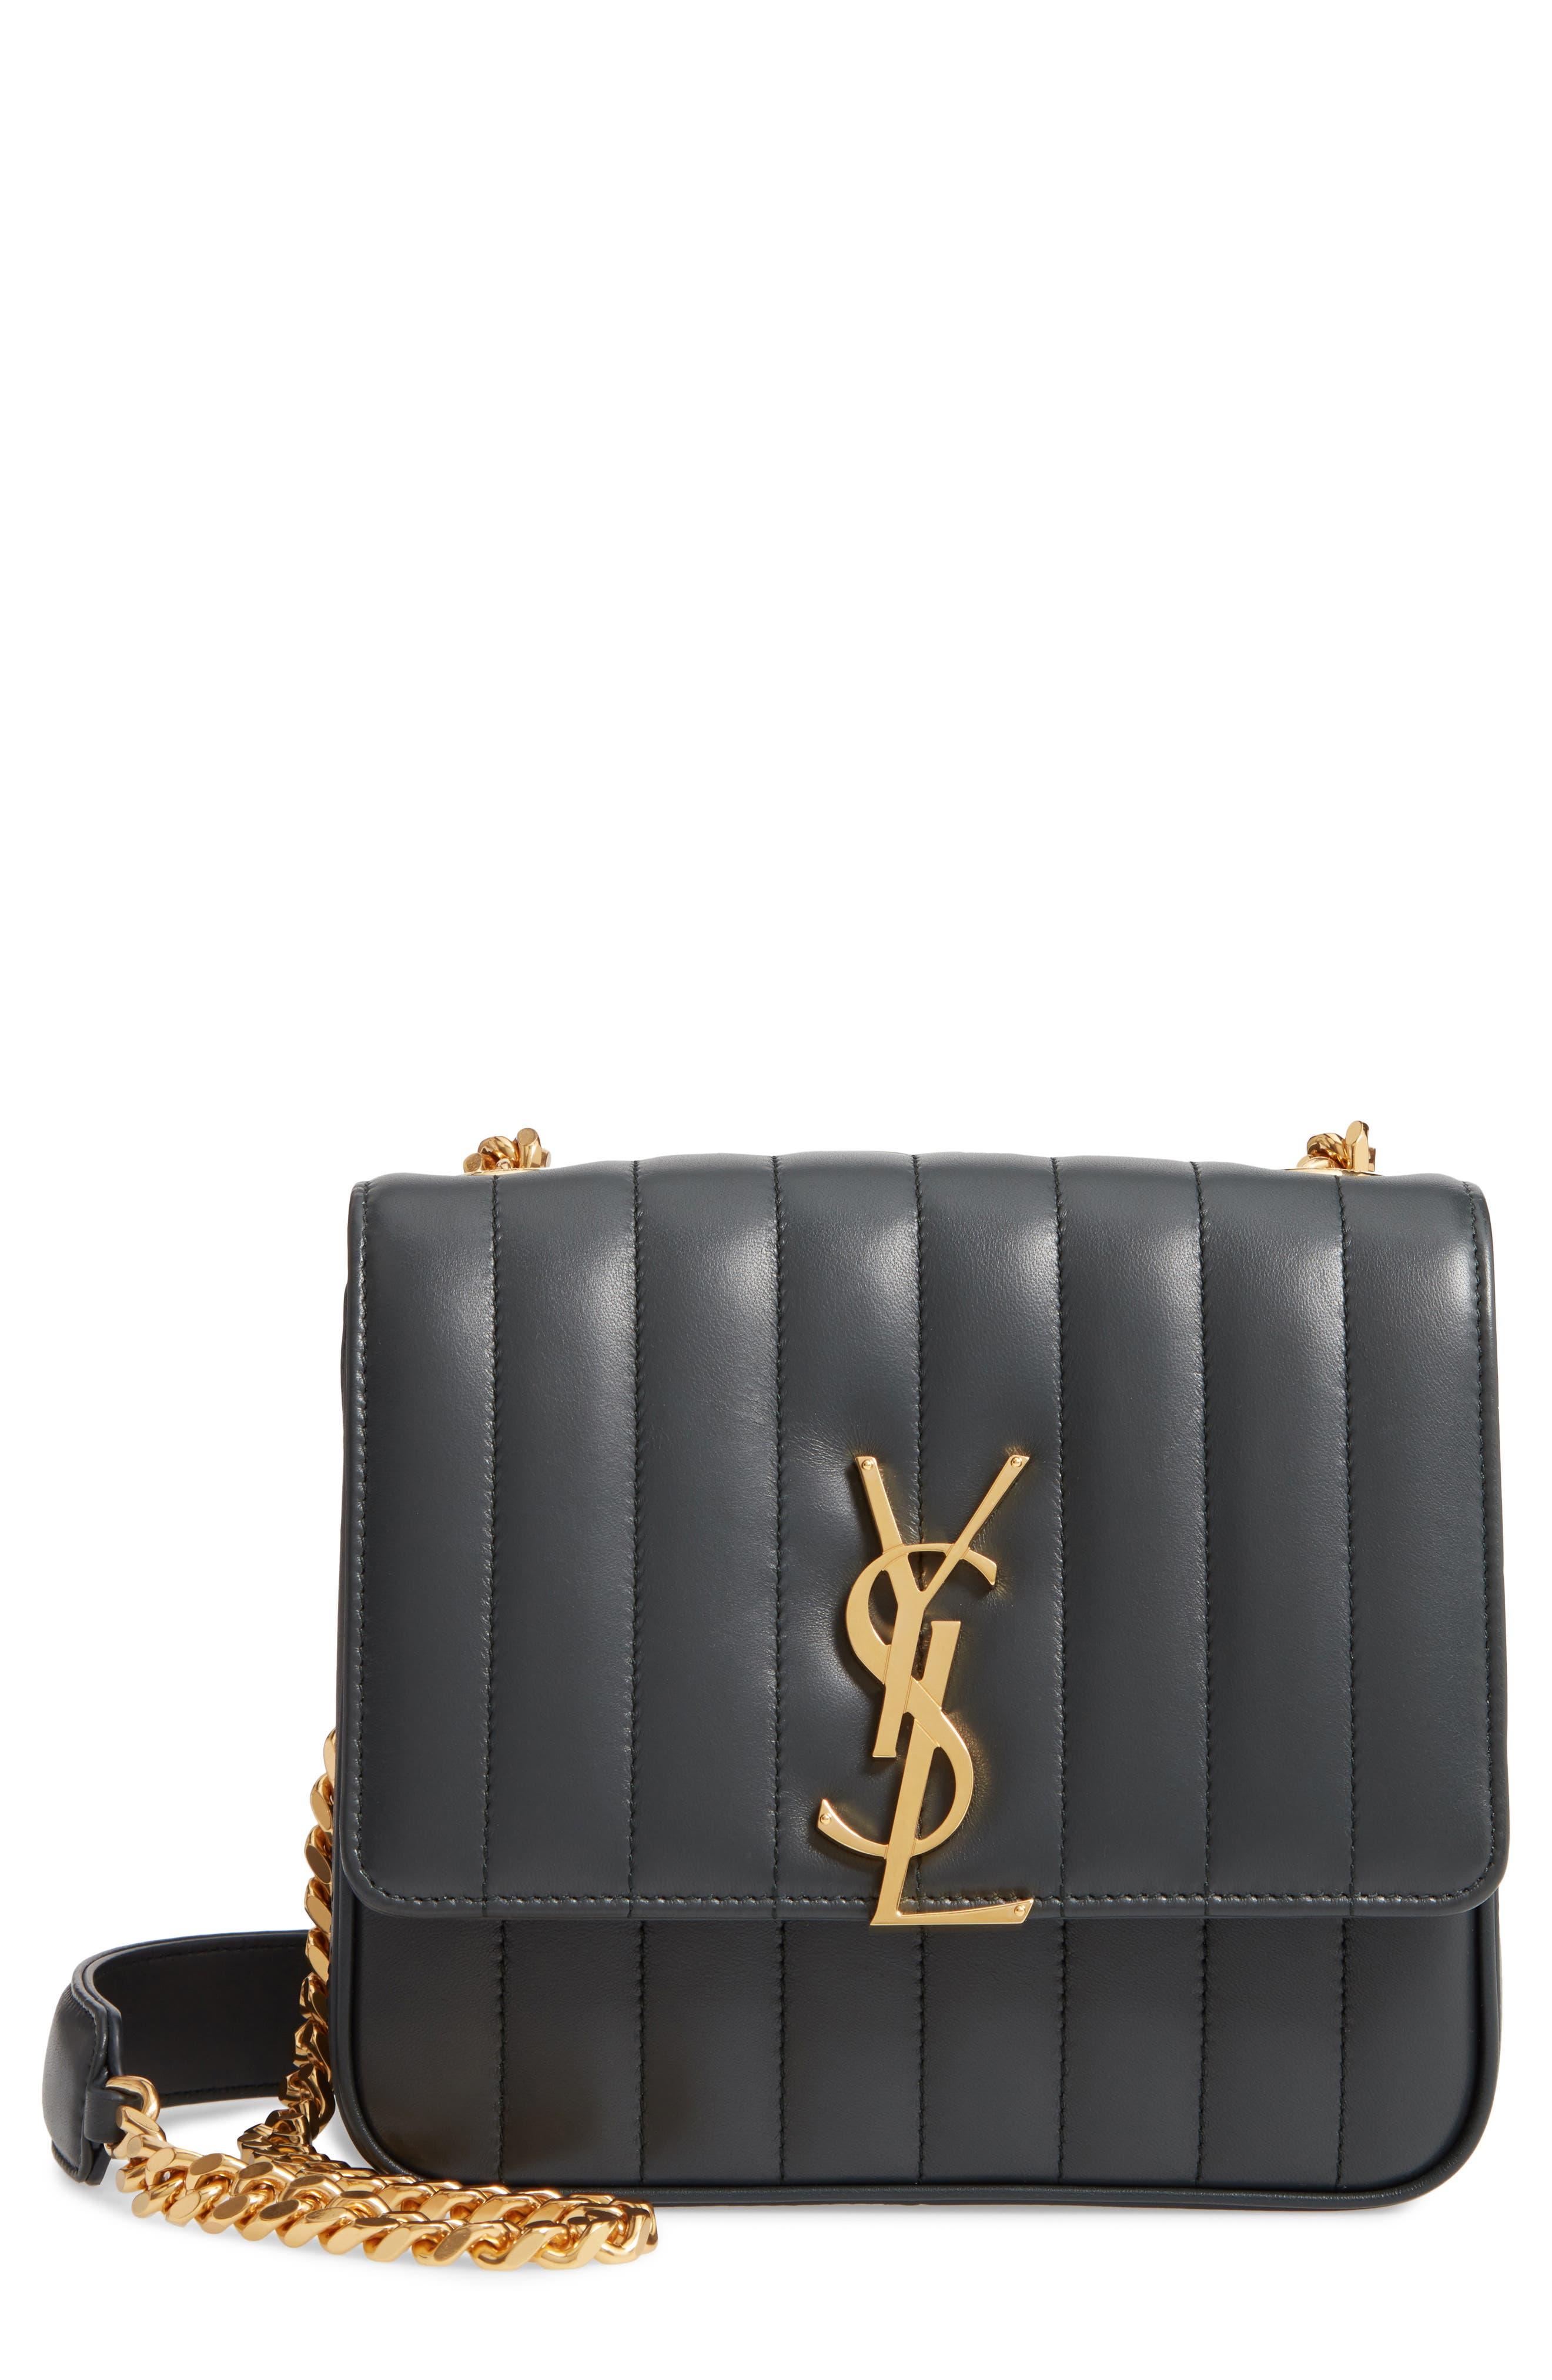 Medium Vicky Leather Crossbody Bag,                         Main,                         color, ALGAE